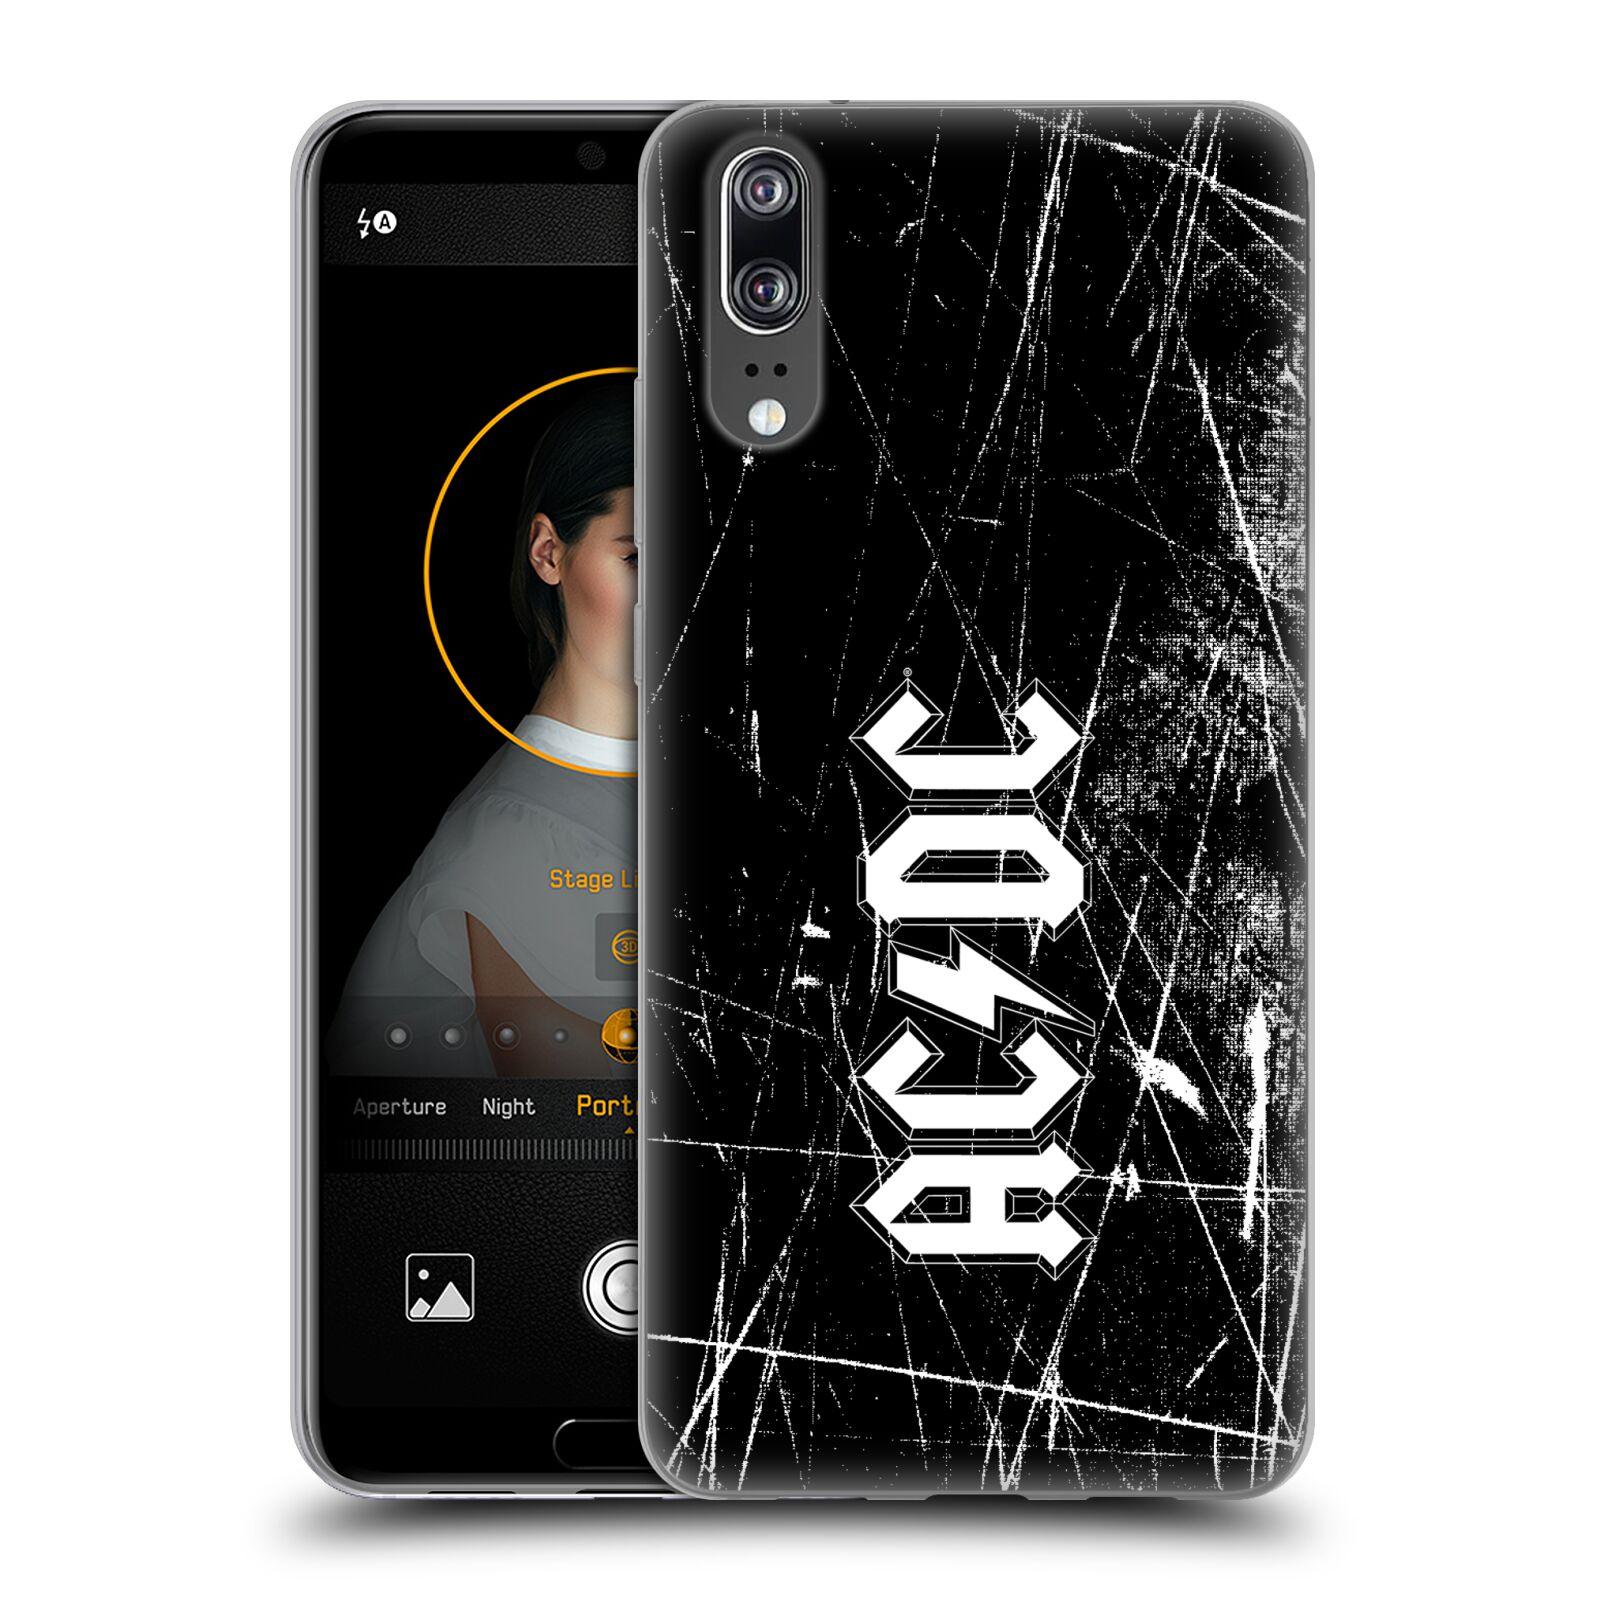 Silikonové pouzdro na mobil Huawei P20 - Head Case - AC/DC Černobílé logo